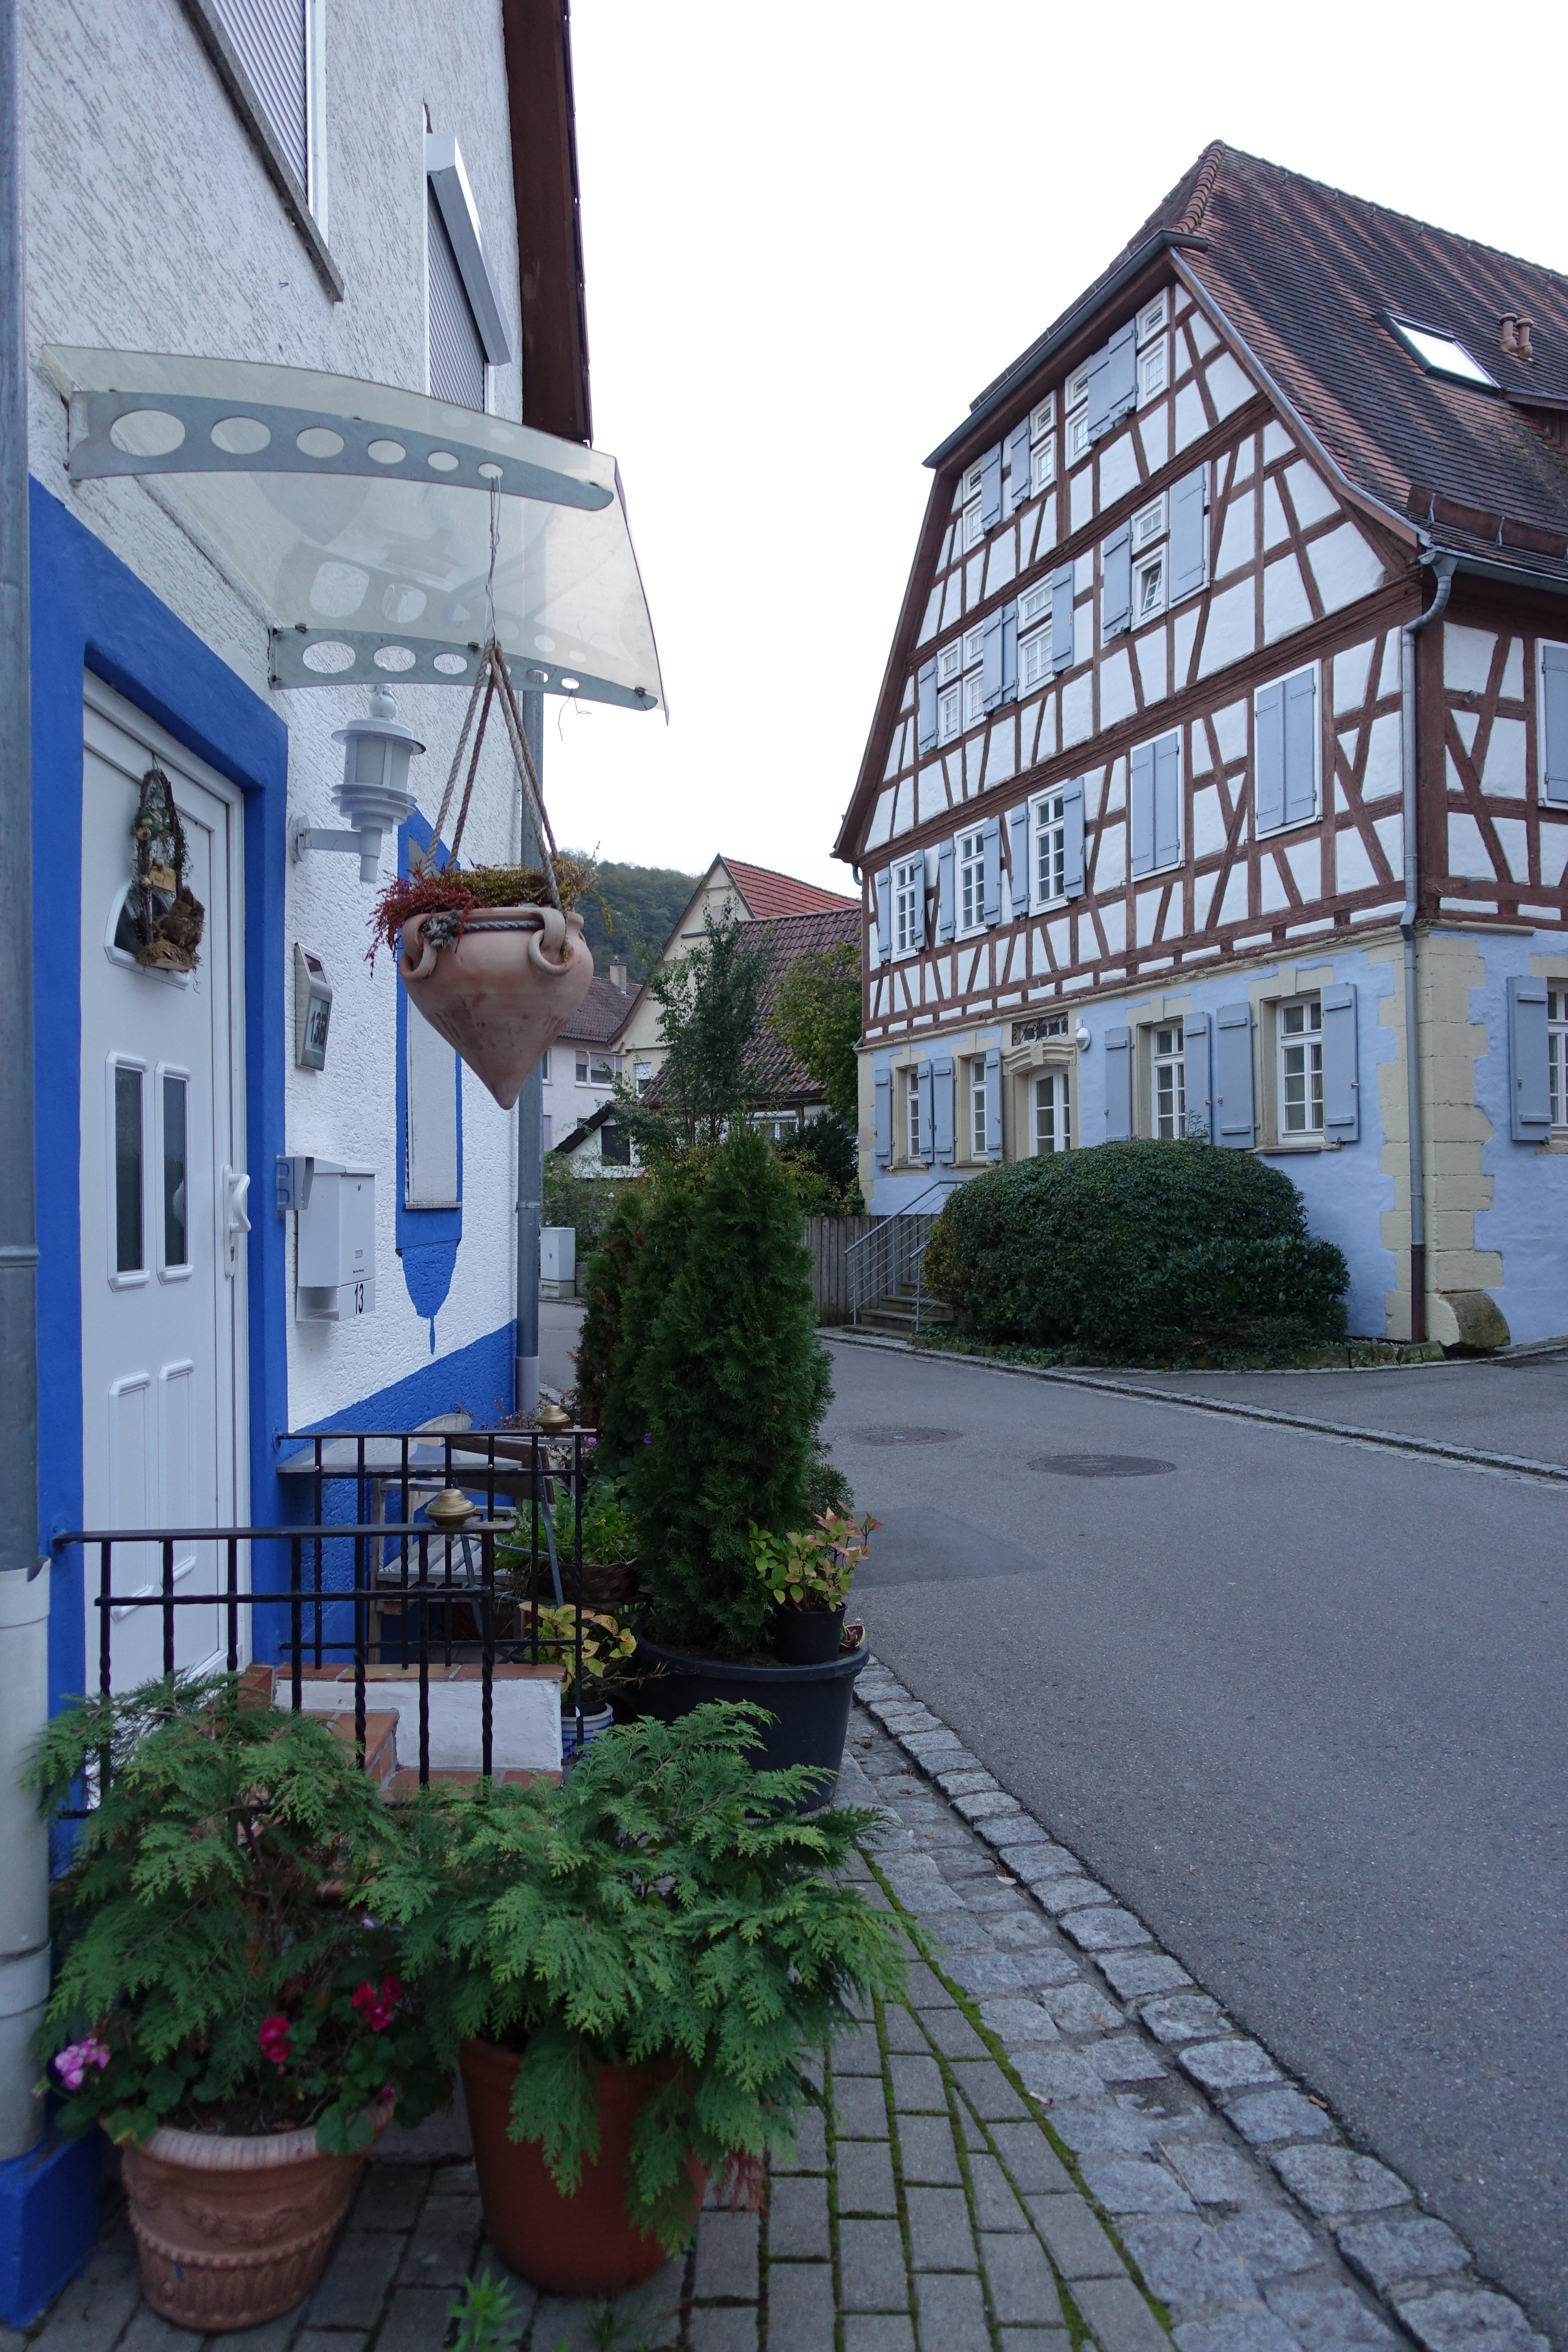 File:Hessigheim - Gasse mit Fachwerkhaus.jpg - Wikimedia Commons